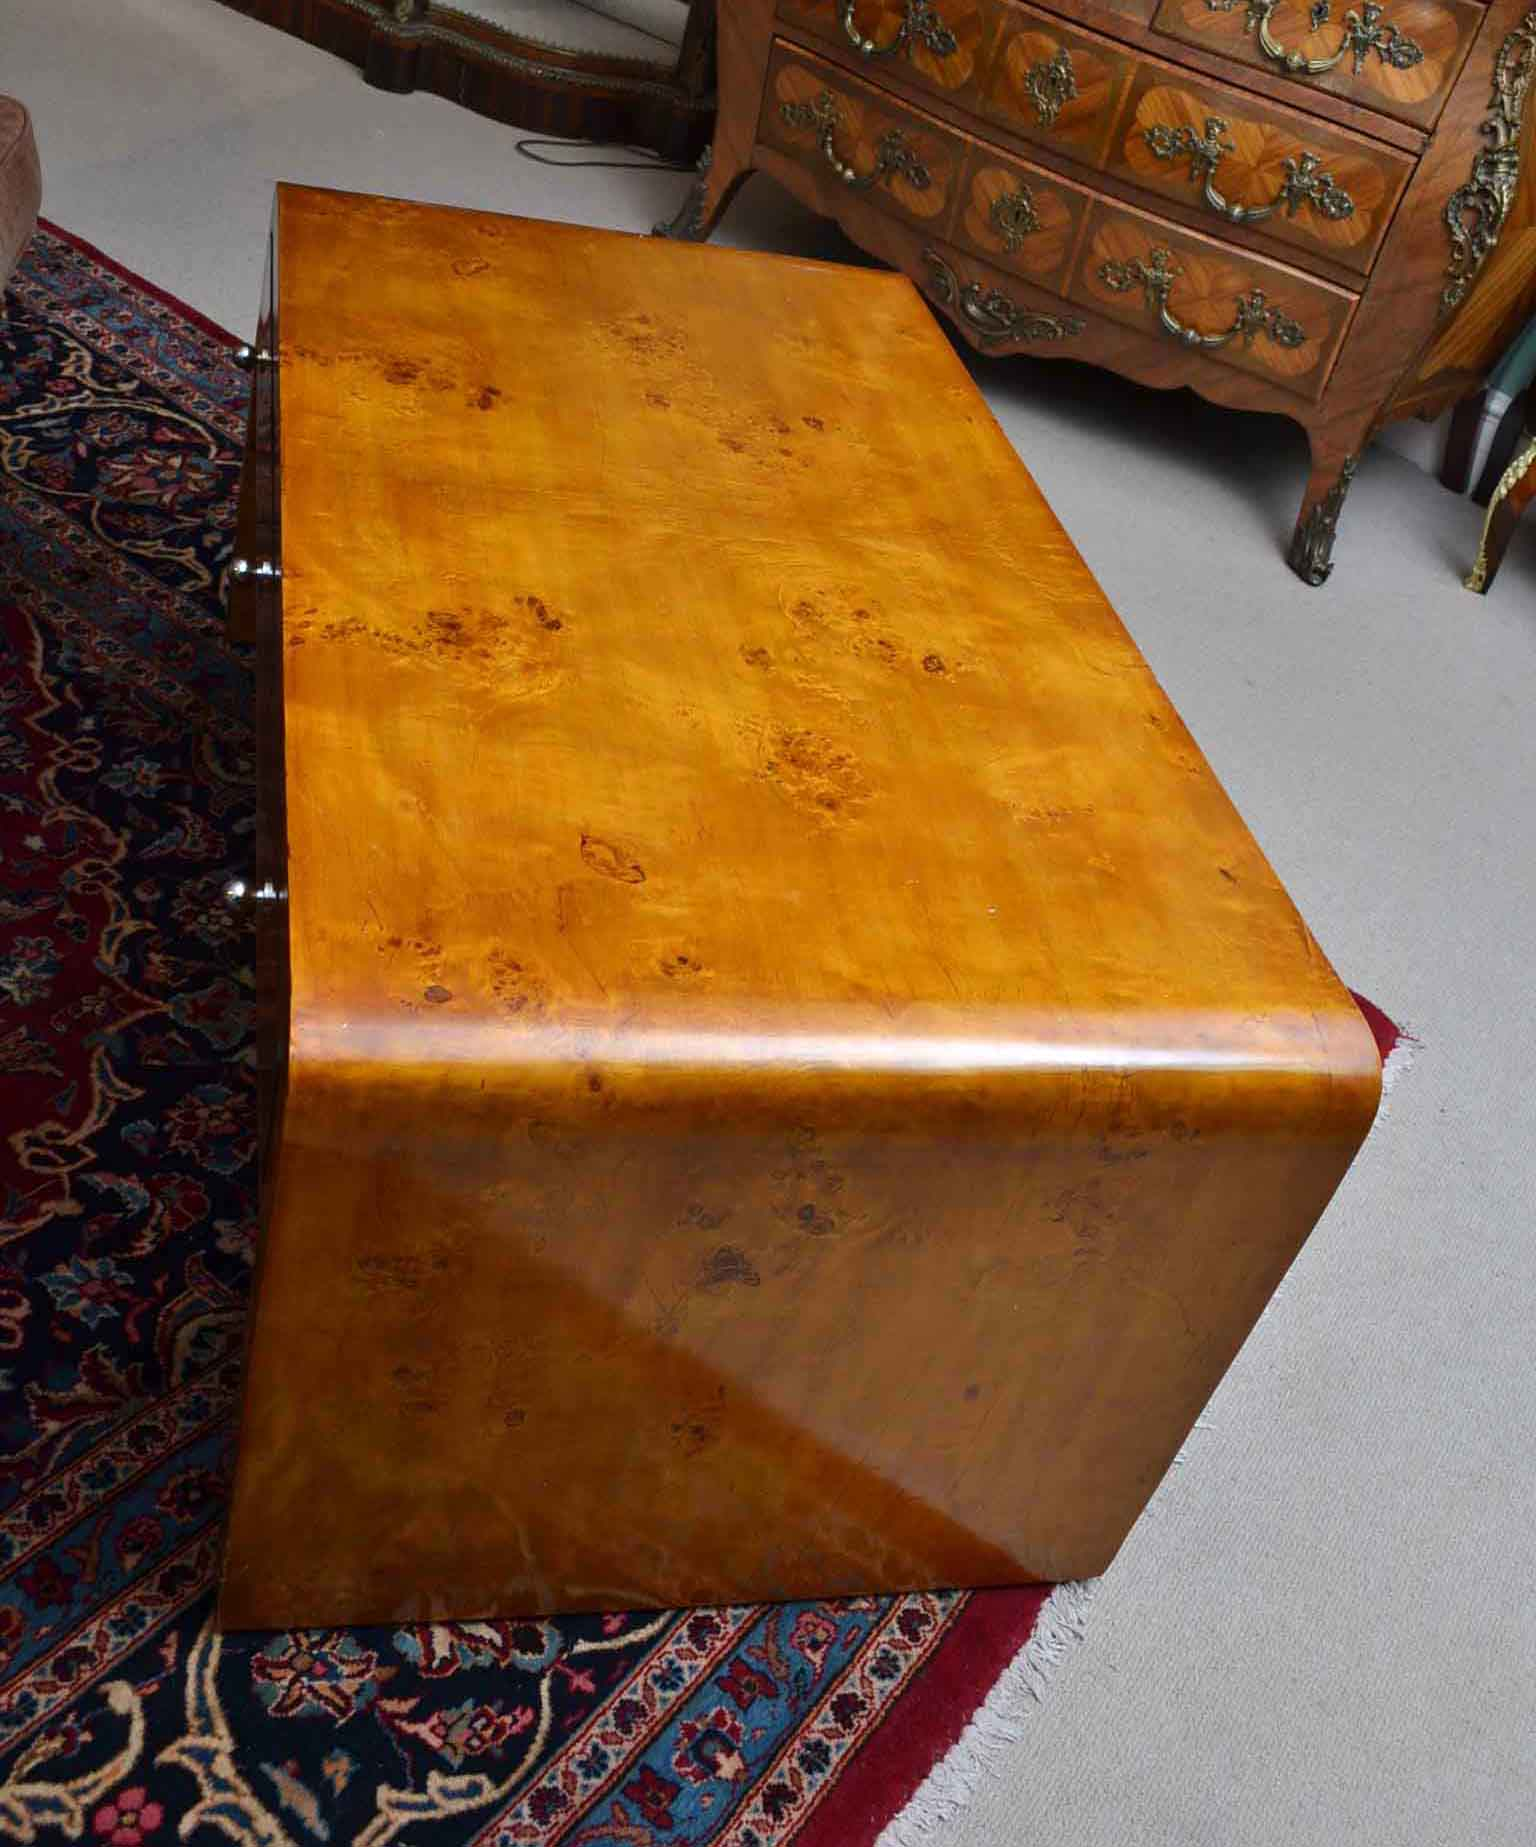 Vintage Maple Coffee Table: Elegant Art Deco Style